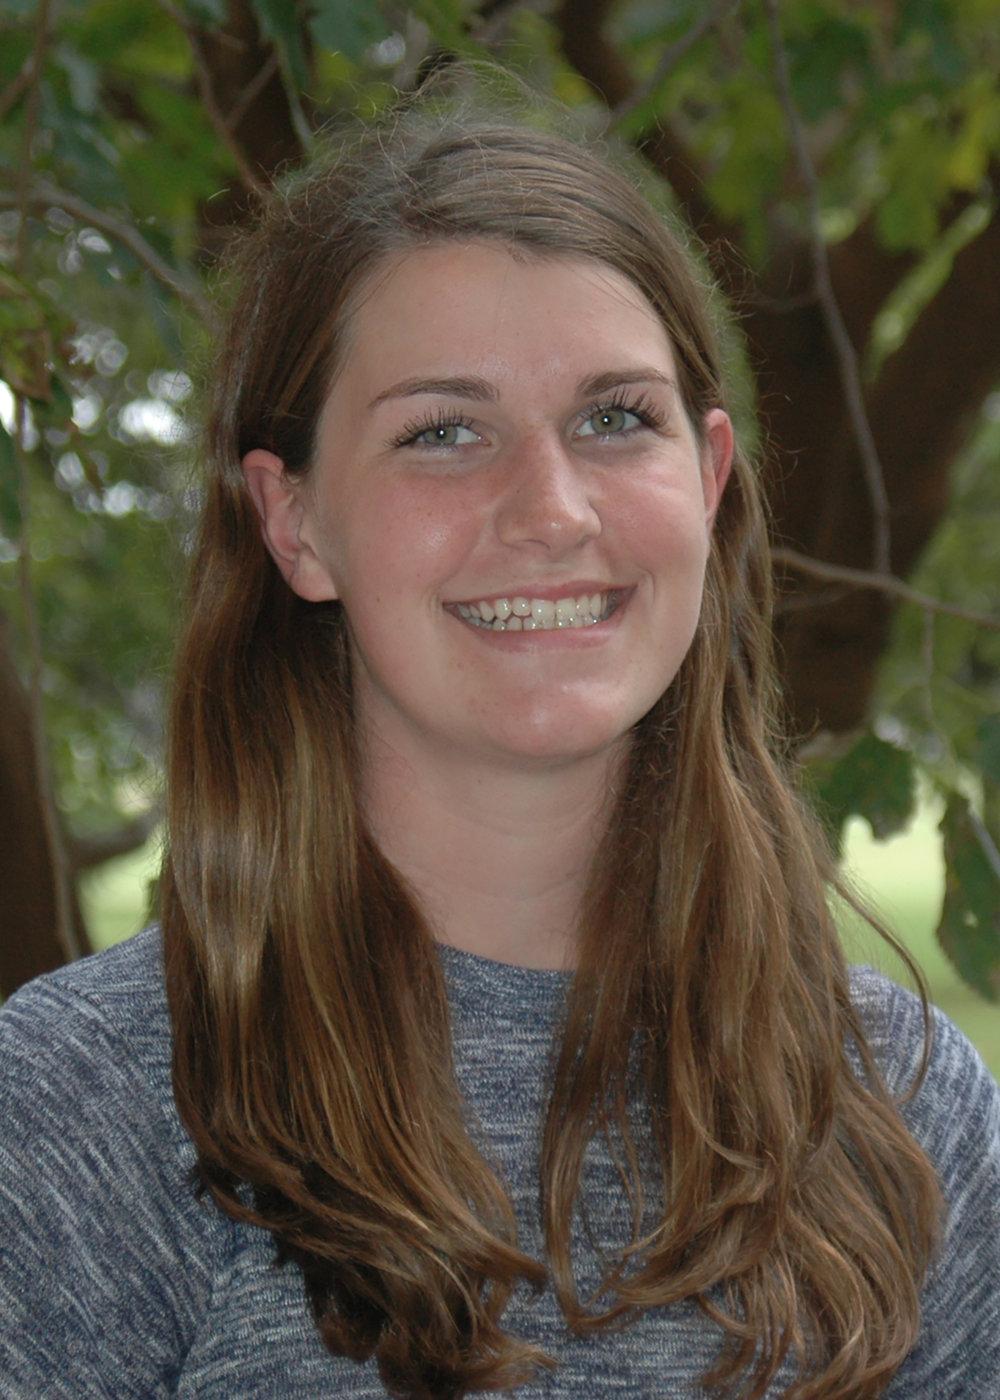 Andreanna Burman   Senior, B.S. in Biology (minor in Chemistry)  Expected Graduation Date: May 2018  Andreanna_Burman@baylor.edu